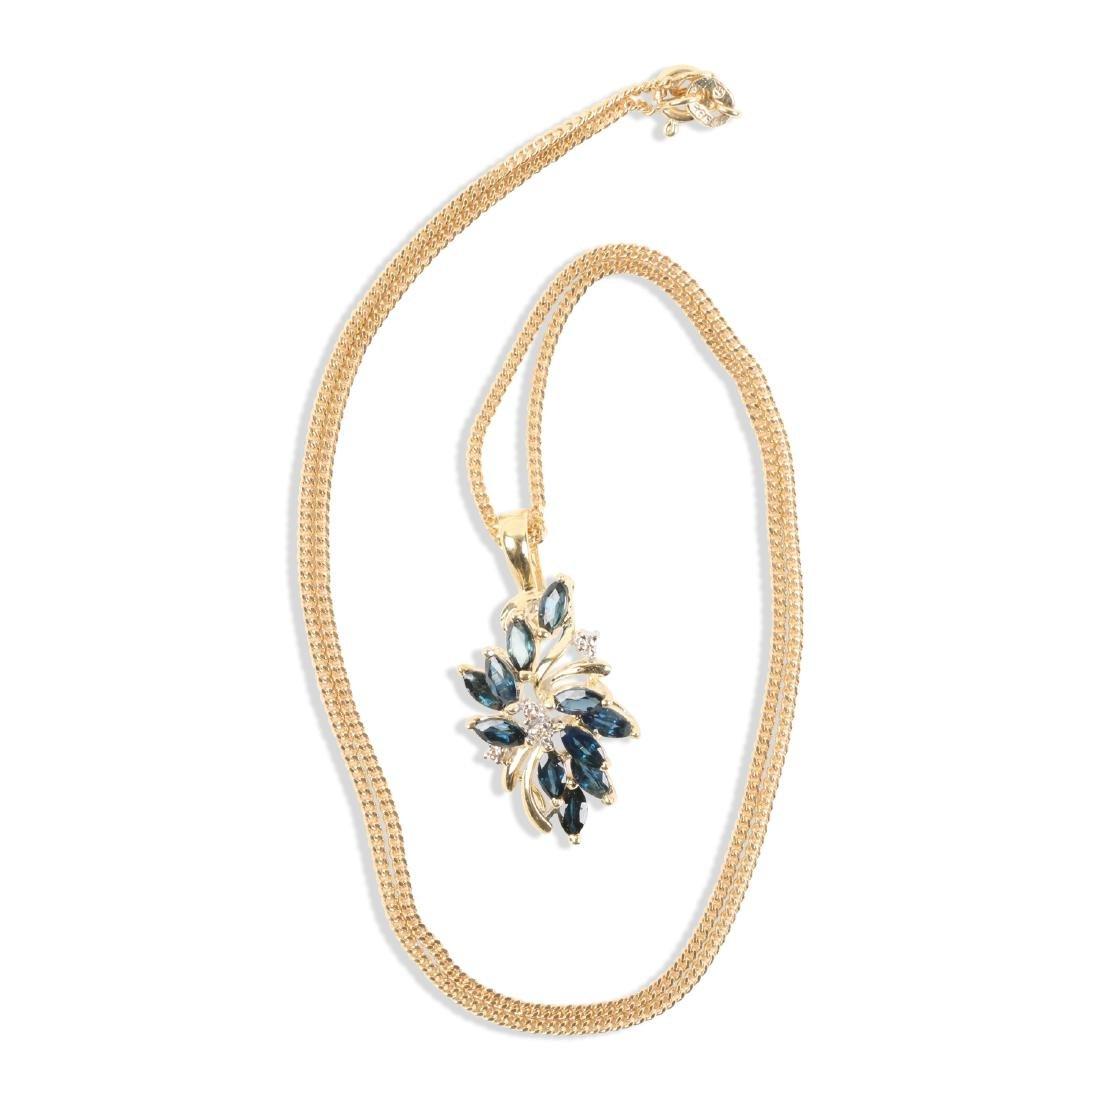 A 14K Gold, Sapphire & Diamond Chain, Pendant